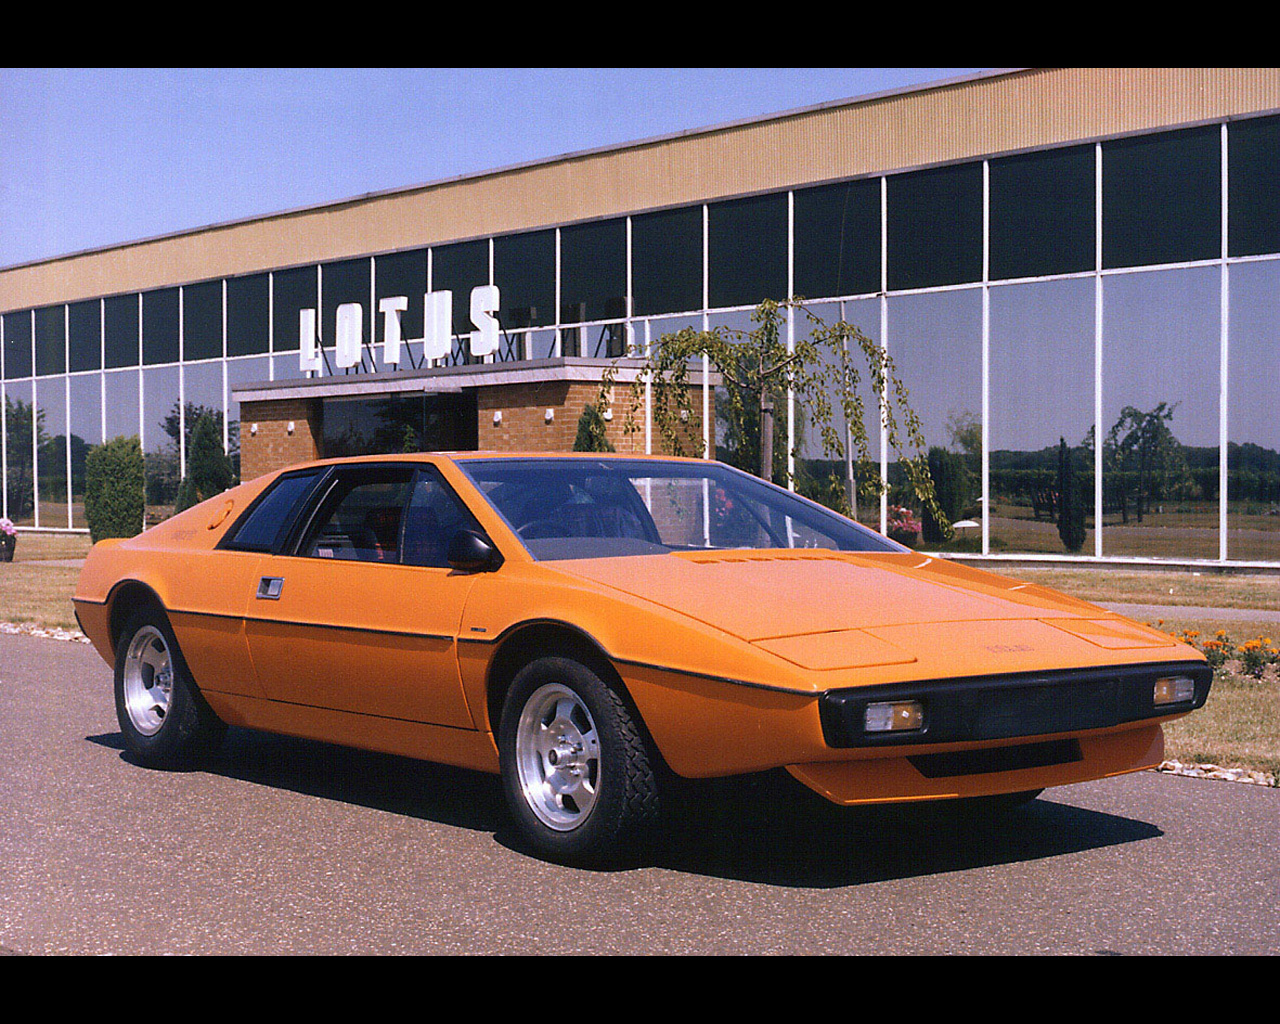 lotus esprit s1 1976 thoughts on automotive design. Black Bedroom Furniture Sets. Home Design Ideas